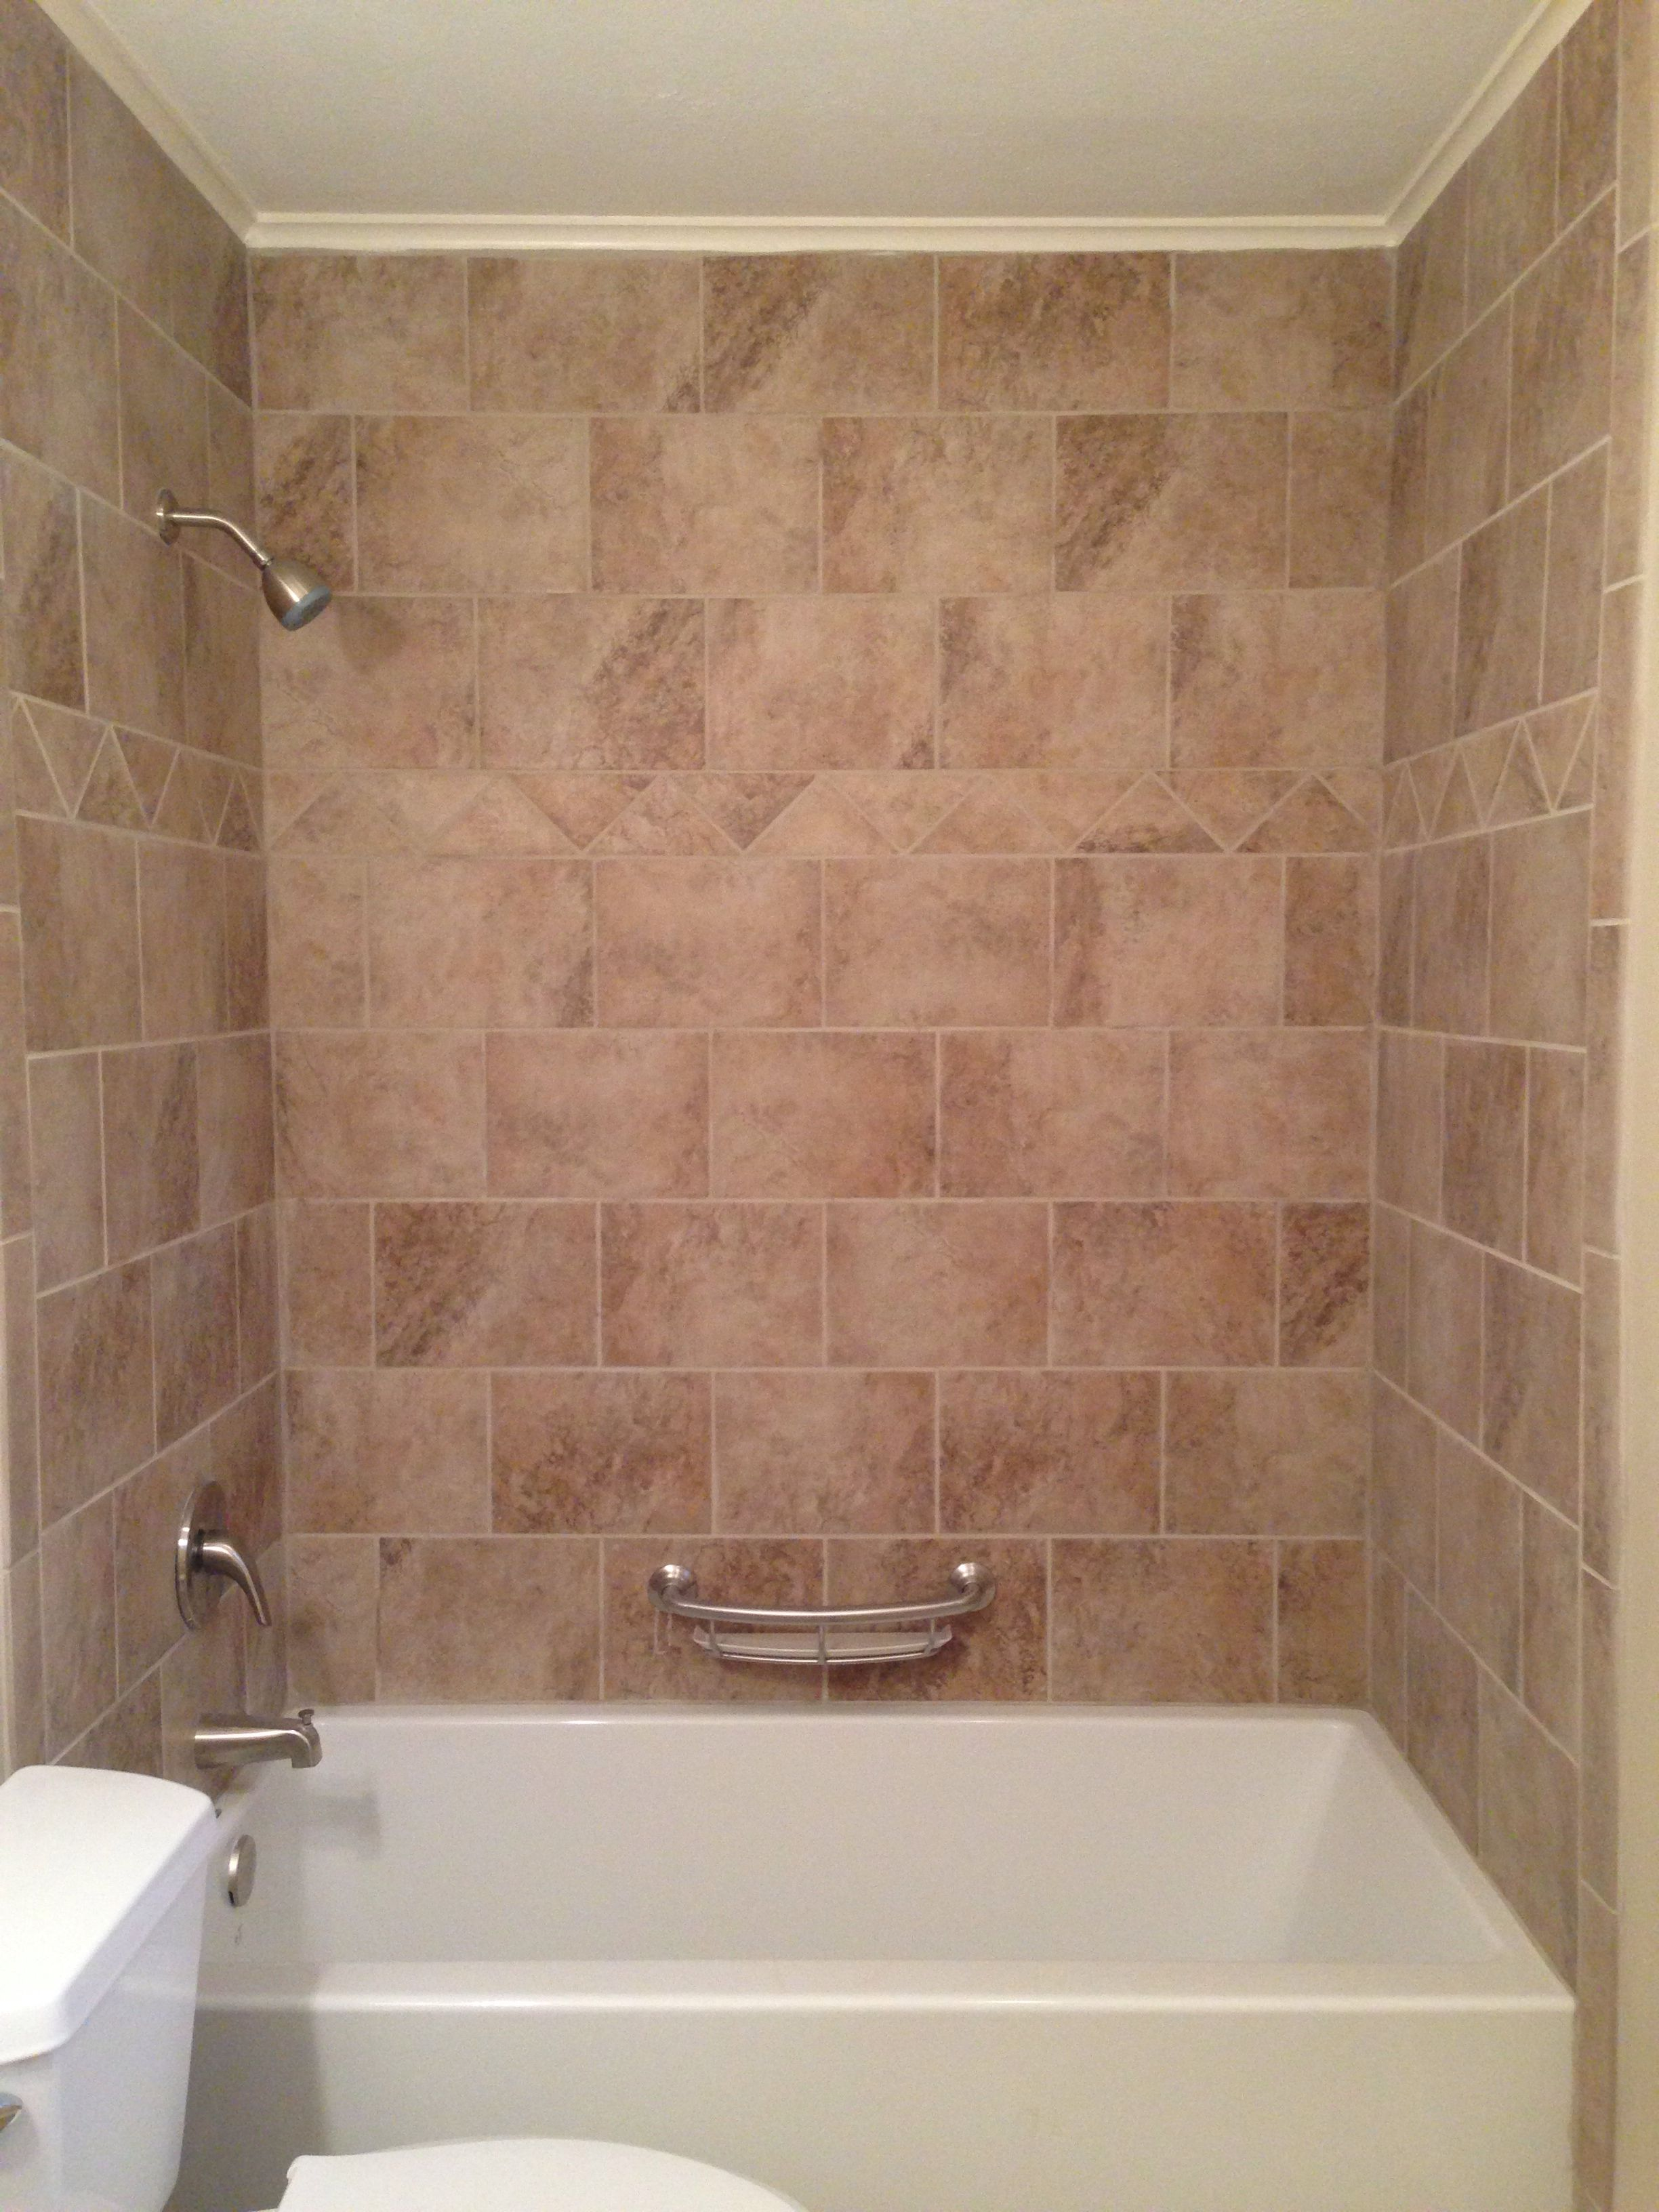 Tile surround bathtub. Beige tile around bathtub.   Our ...